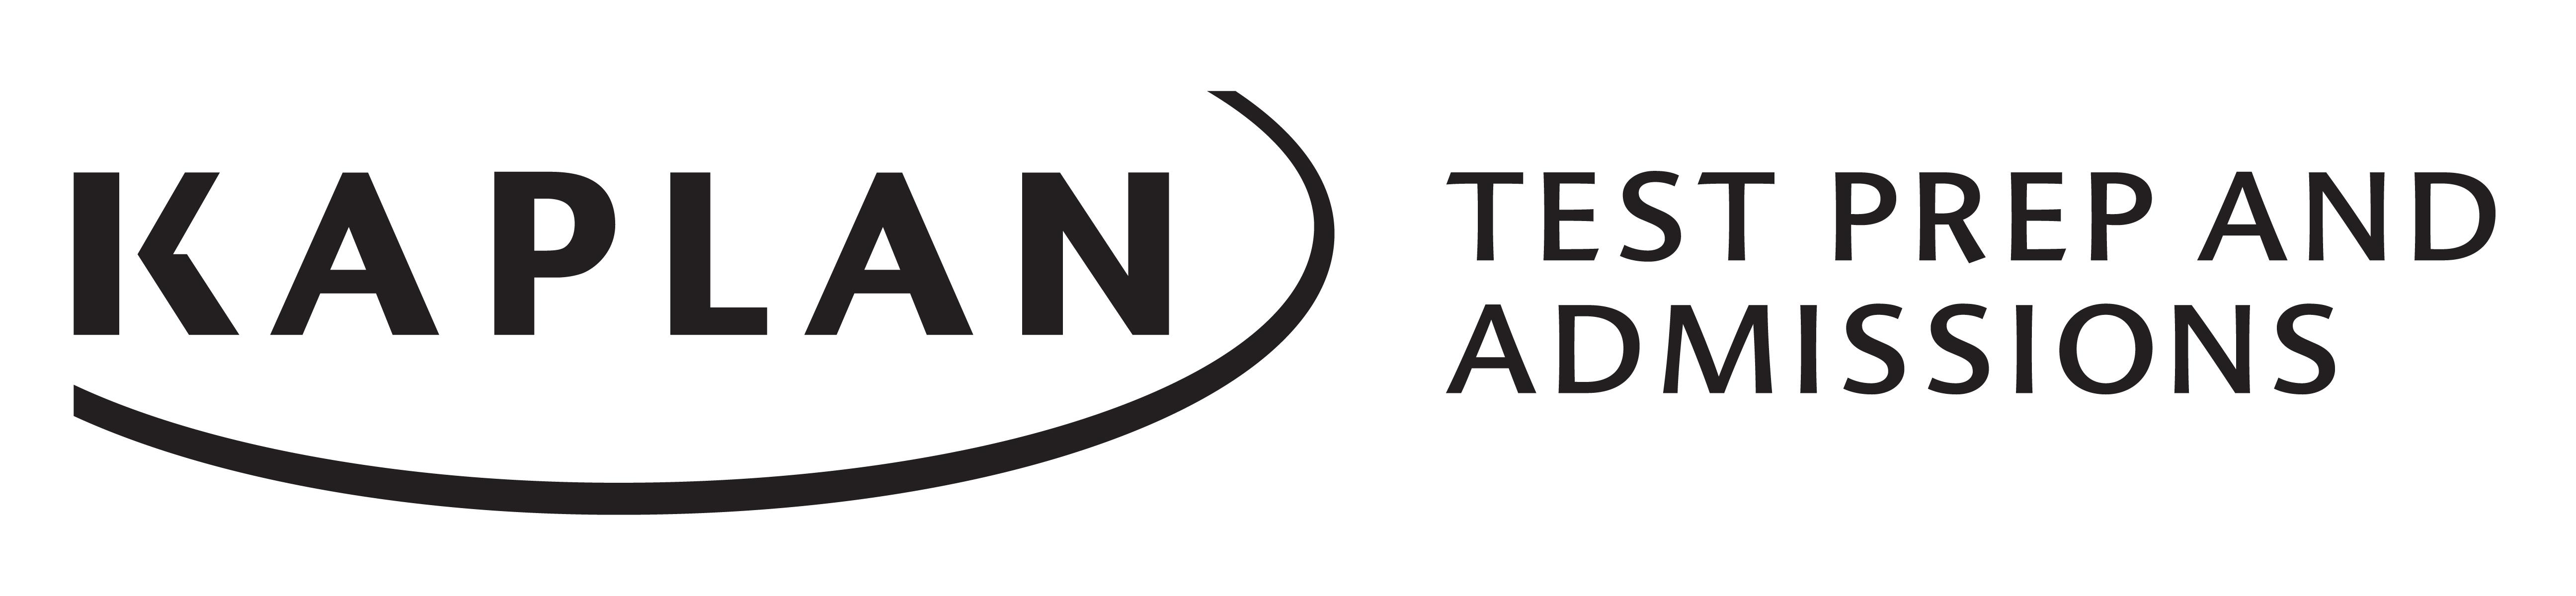 Kaplan SAT/ACT Practice Test Nov  16 | Oakton HS PTSA TEST and